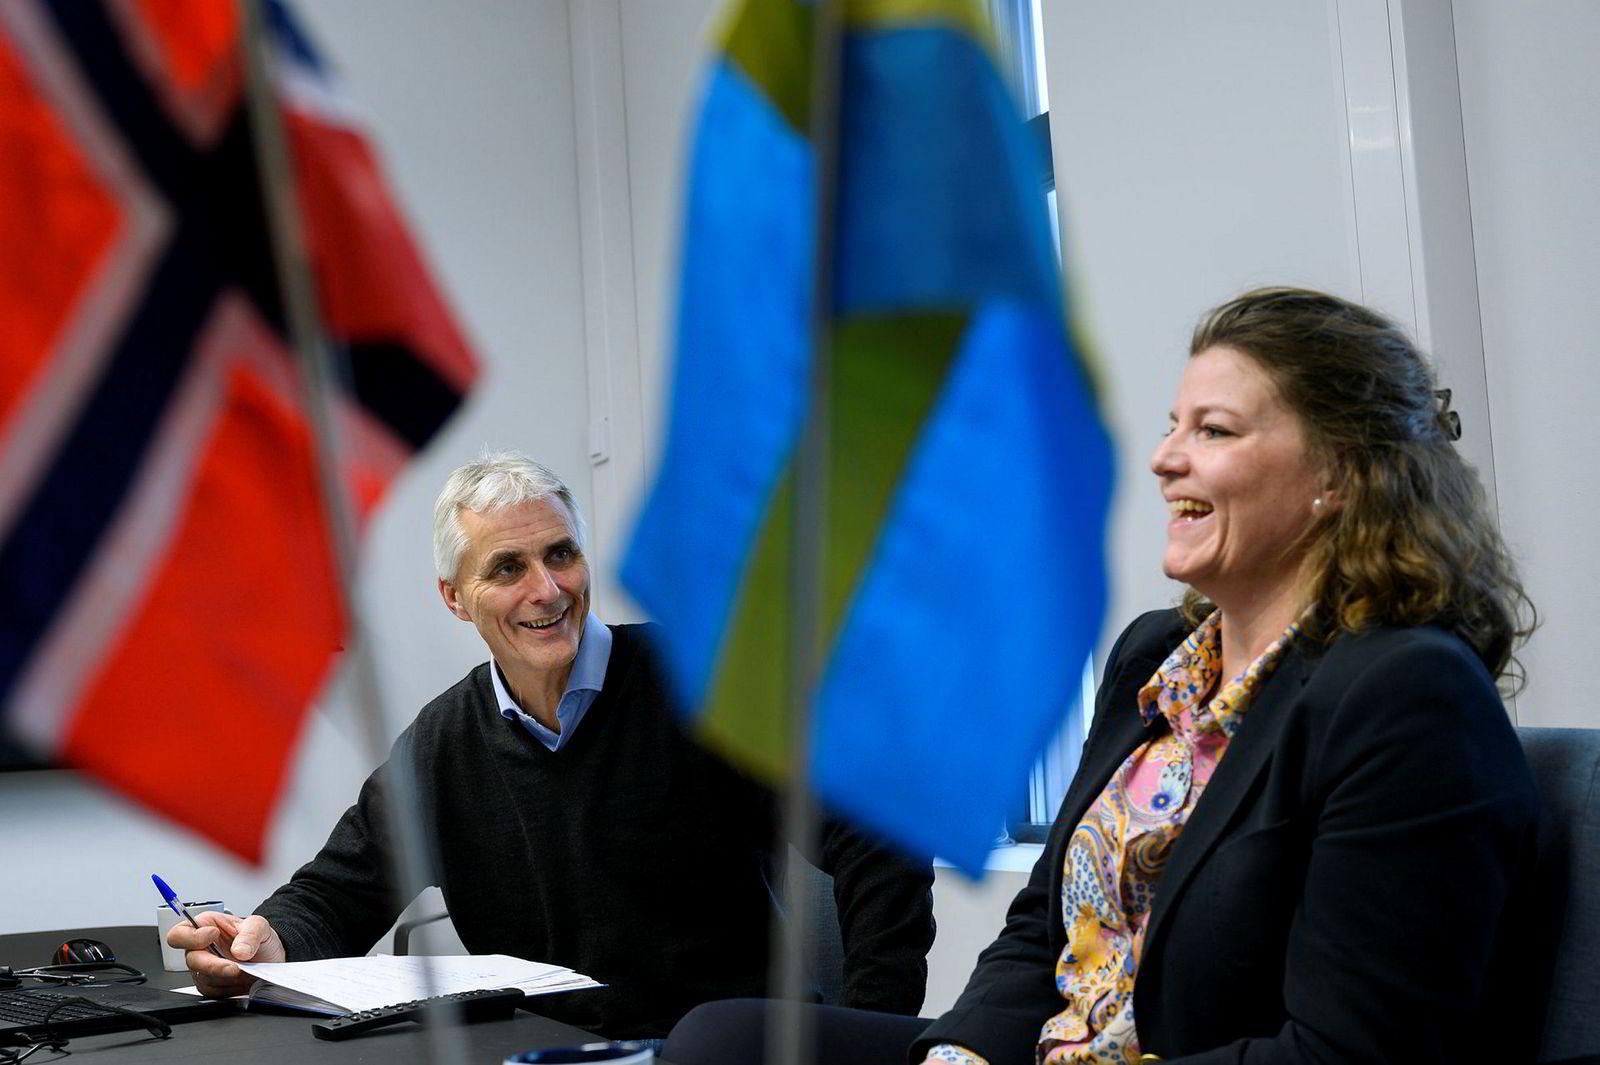 – Da vi tok juleferie i 2015 hadde vi fått strømmåler-kontrakter på nesten 650 millioner kroner, sier daglig leder Bent Kvannli i Smartservice Norge. Til venstre daglig leder Nan Rogstad i Smartservice Nordic Contractors AB.